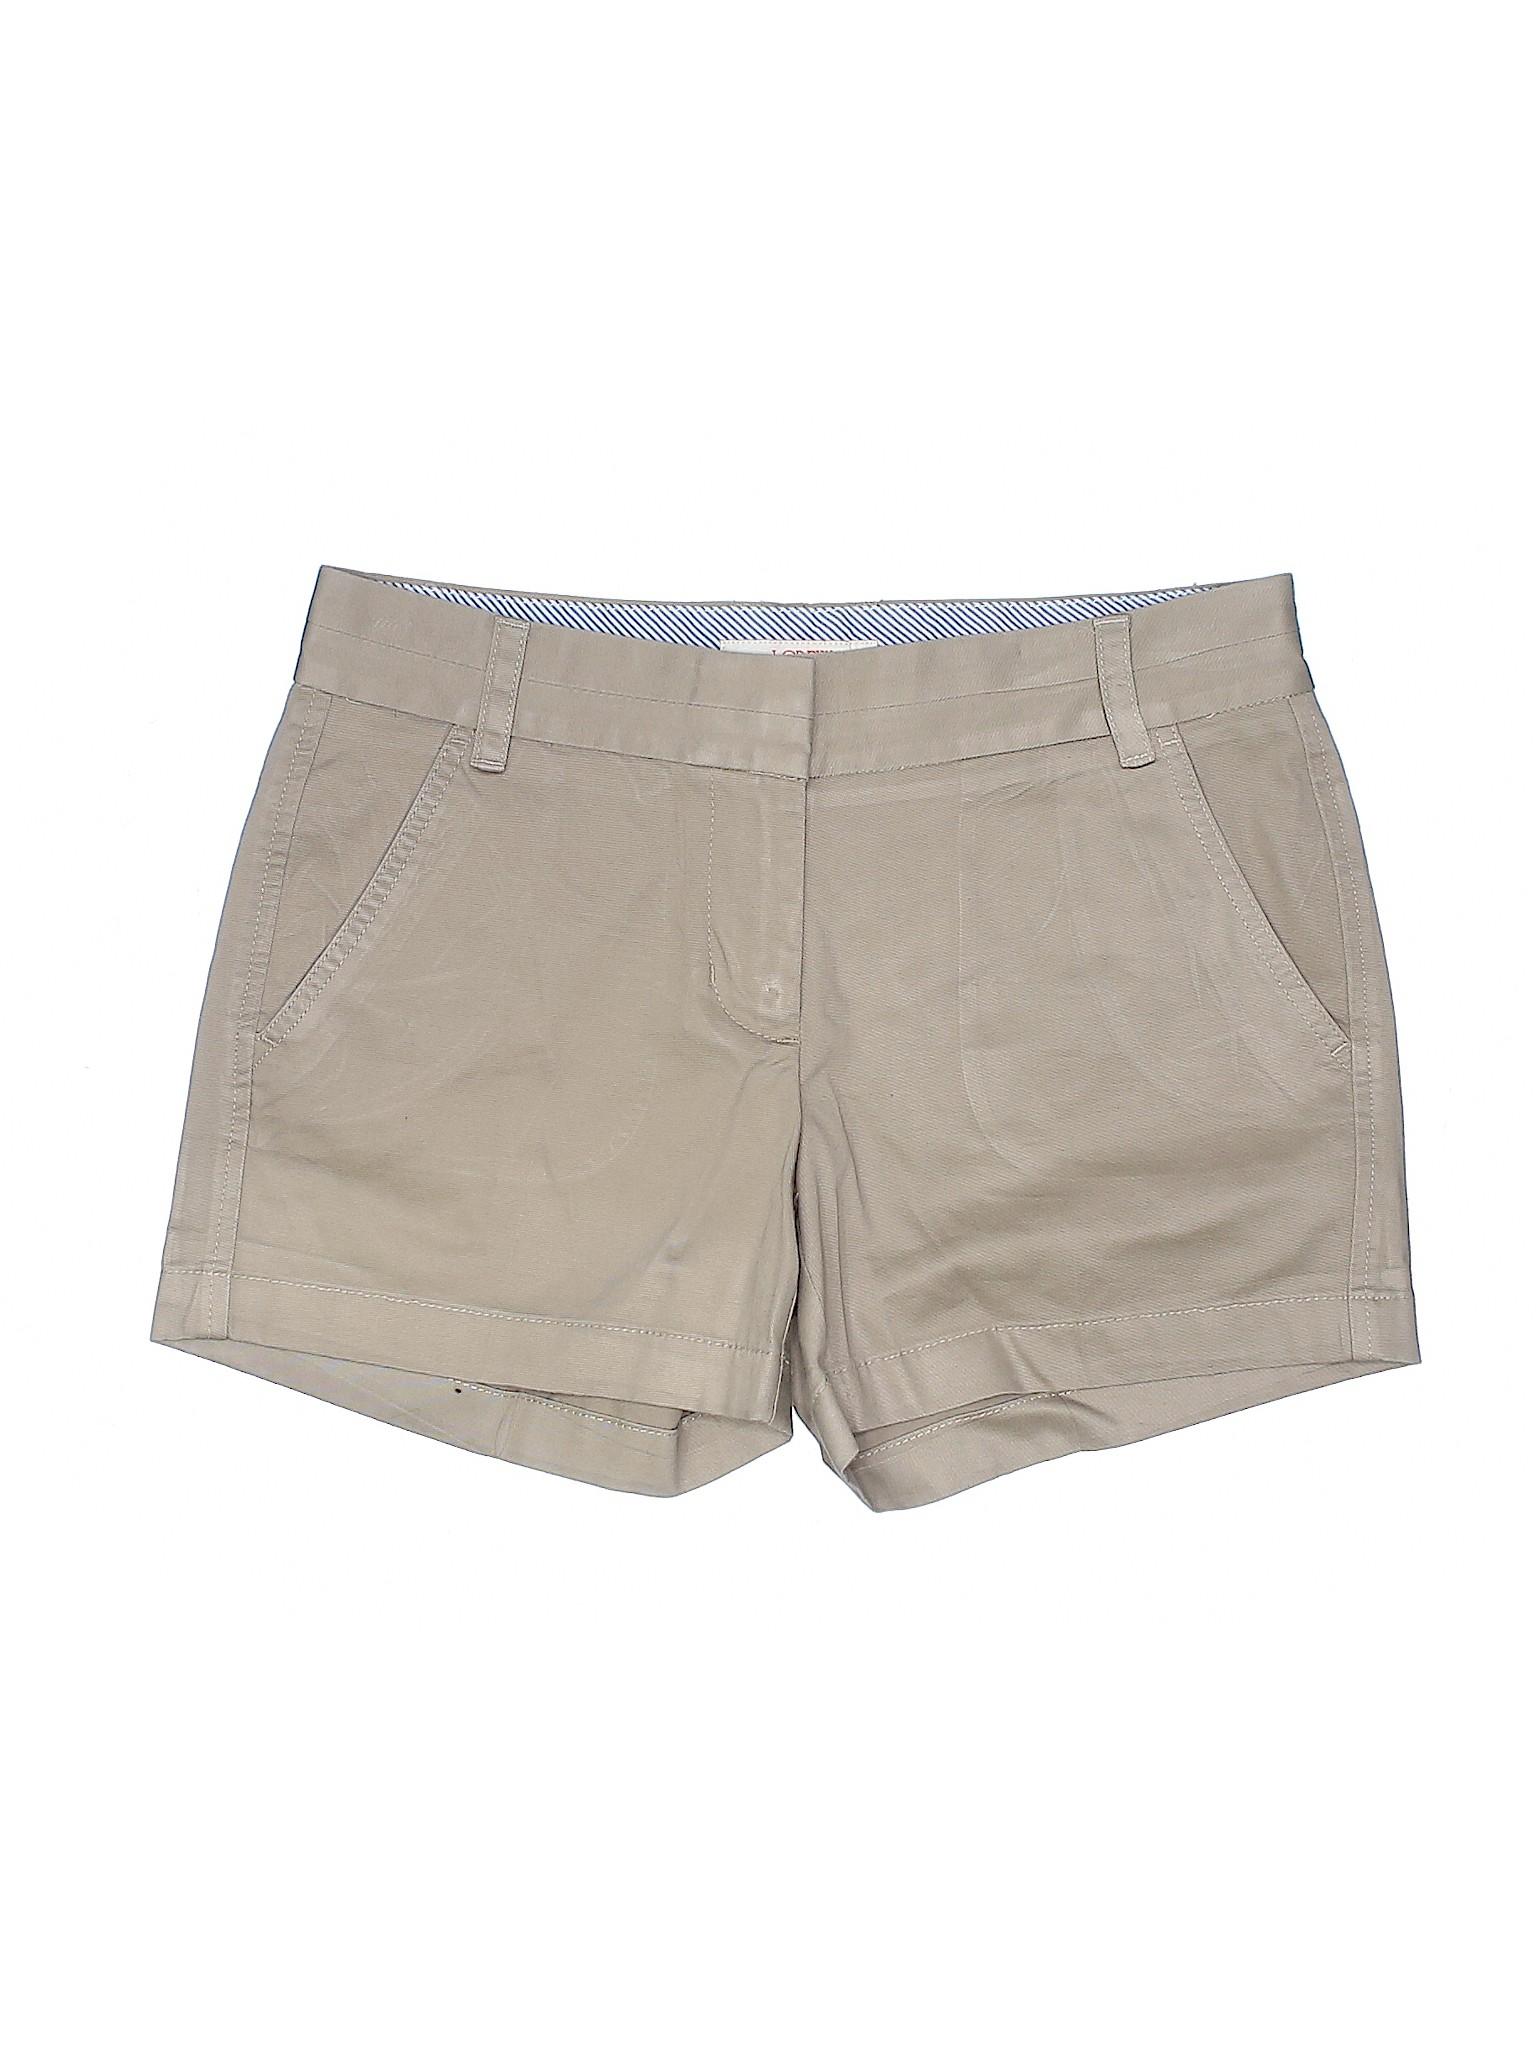 winter Shorts J Leisure Crew Khaki dwqdRC